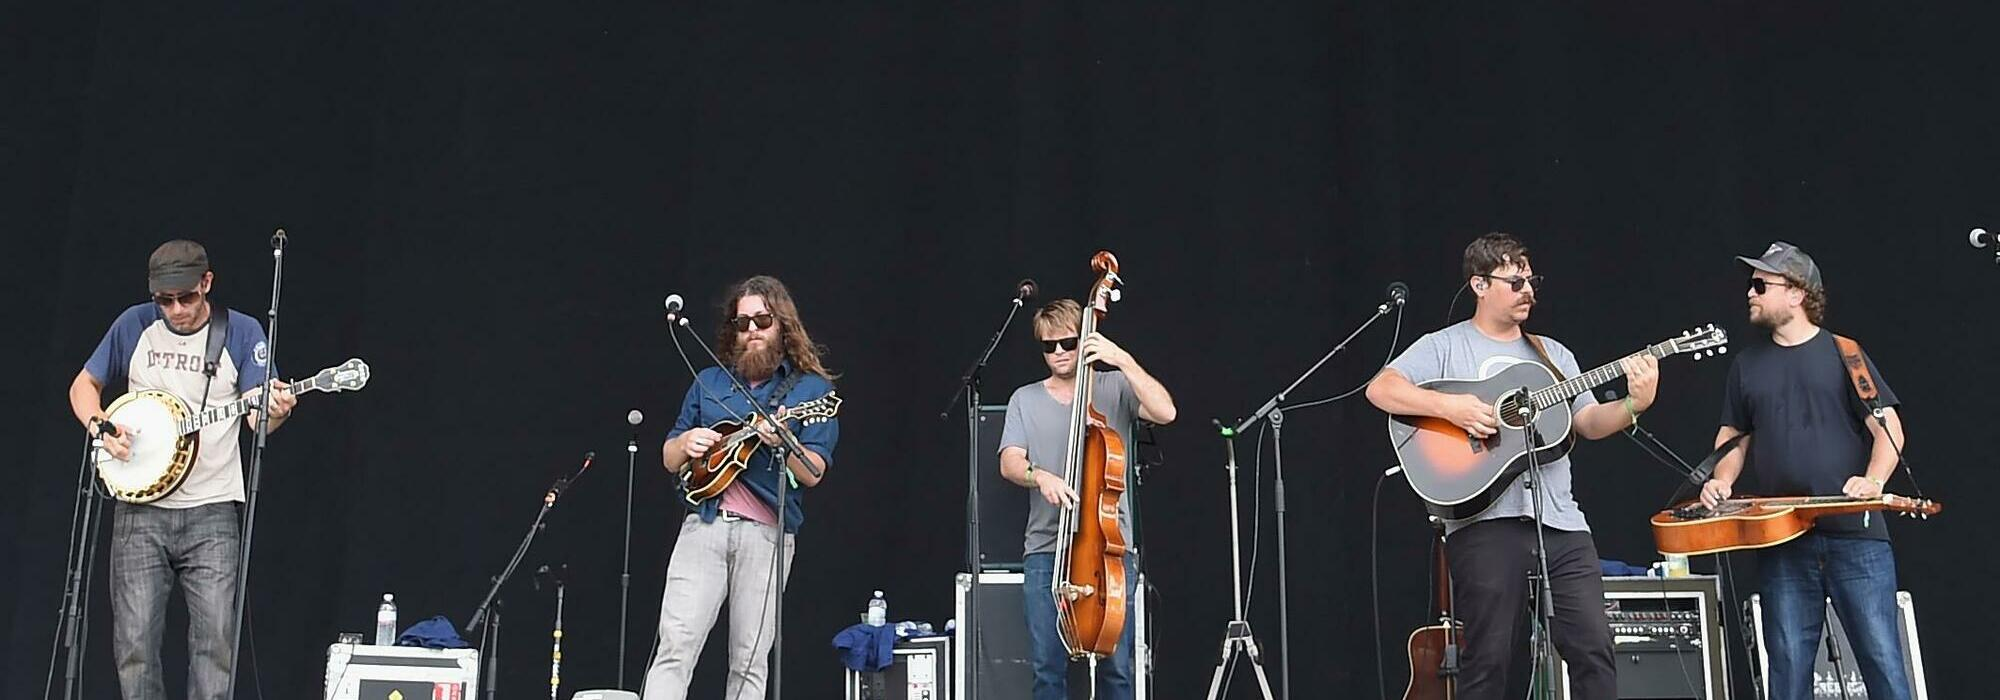 A Greensky Bluegrass live event